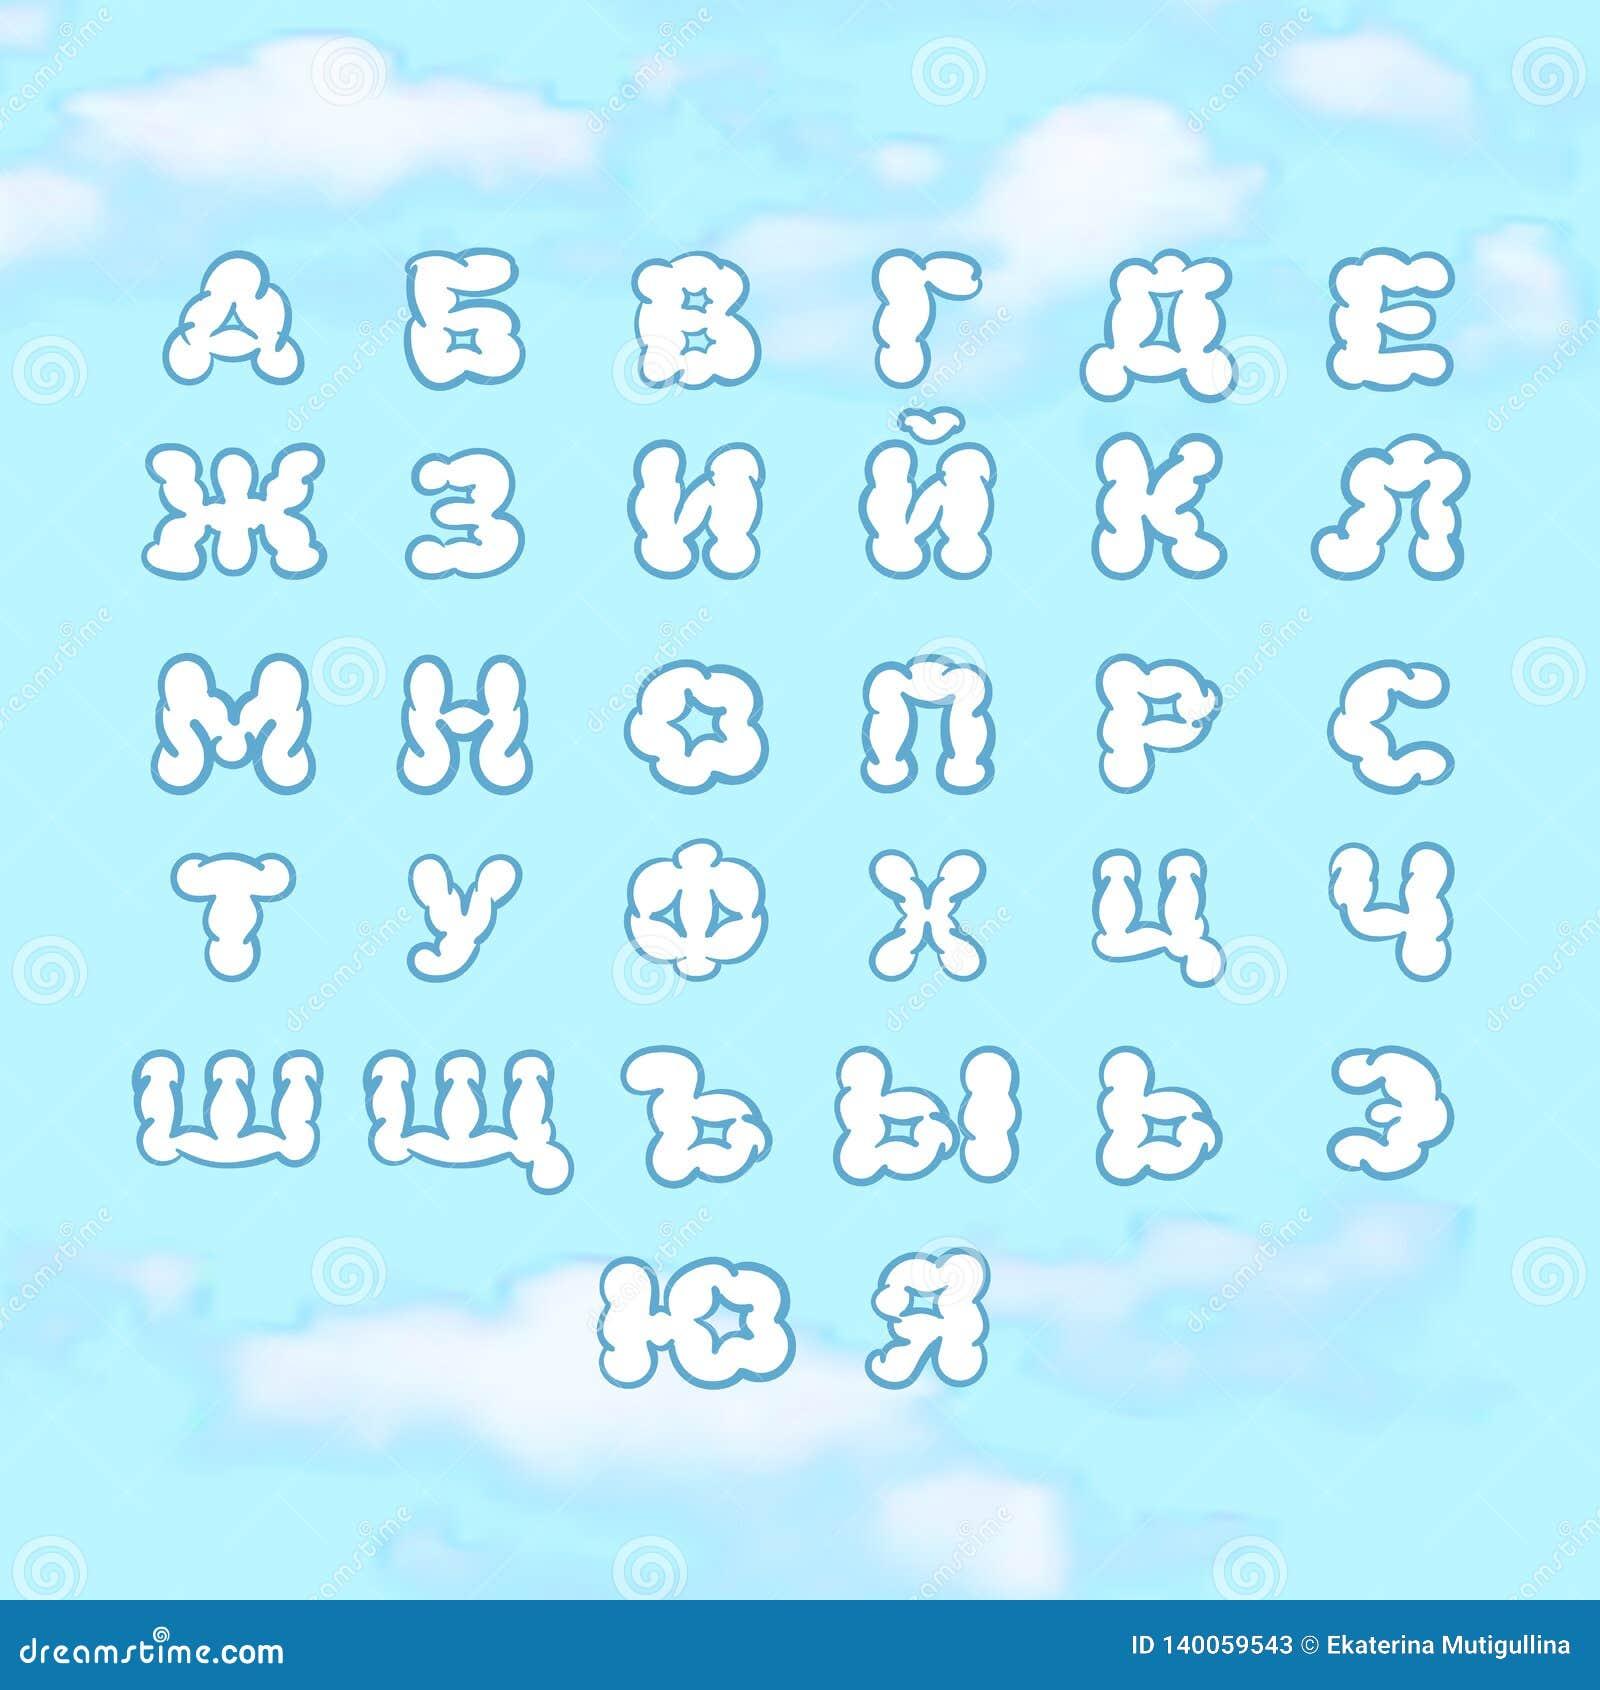 Cyrillic molnalfabet